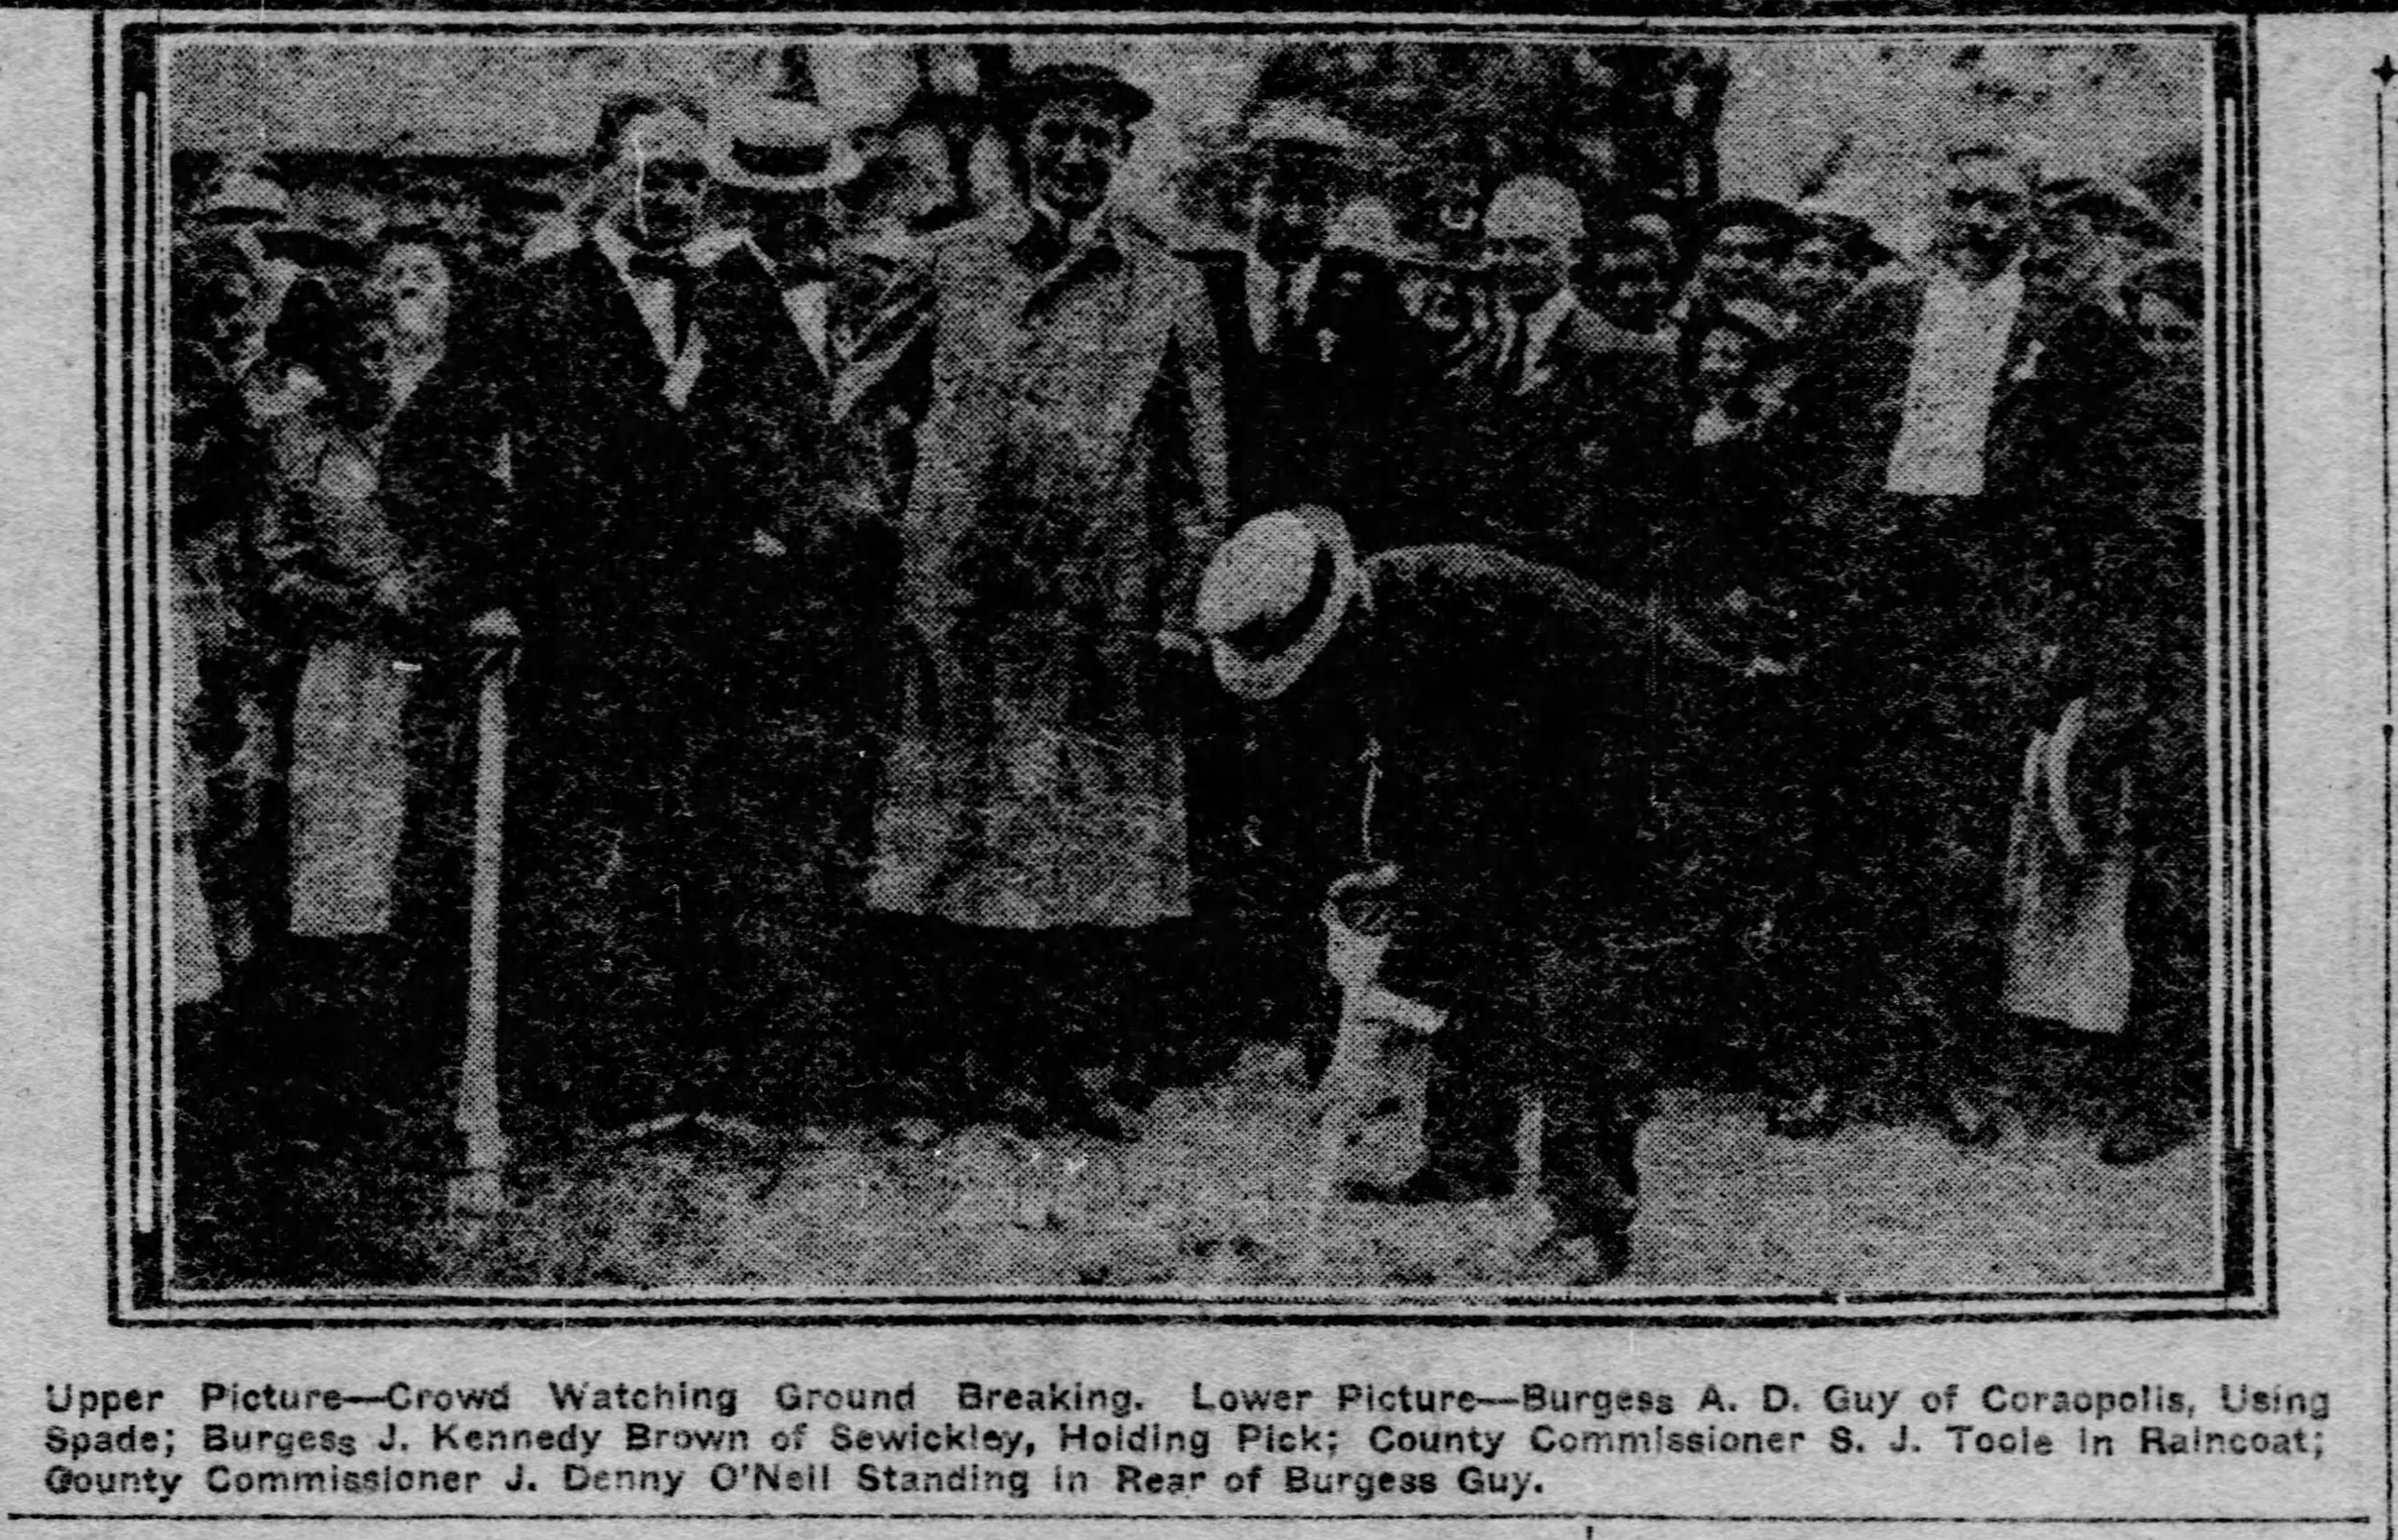 1909-07-22 The Pittsburgh Gazette-Times (p2)-photo2.jpg